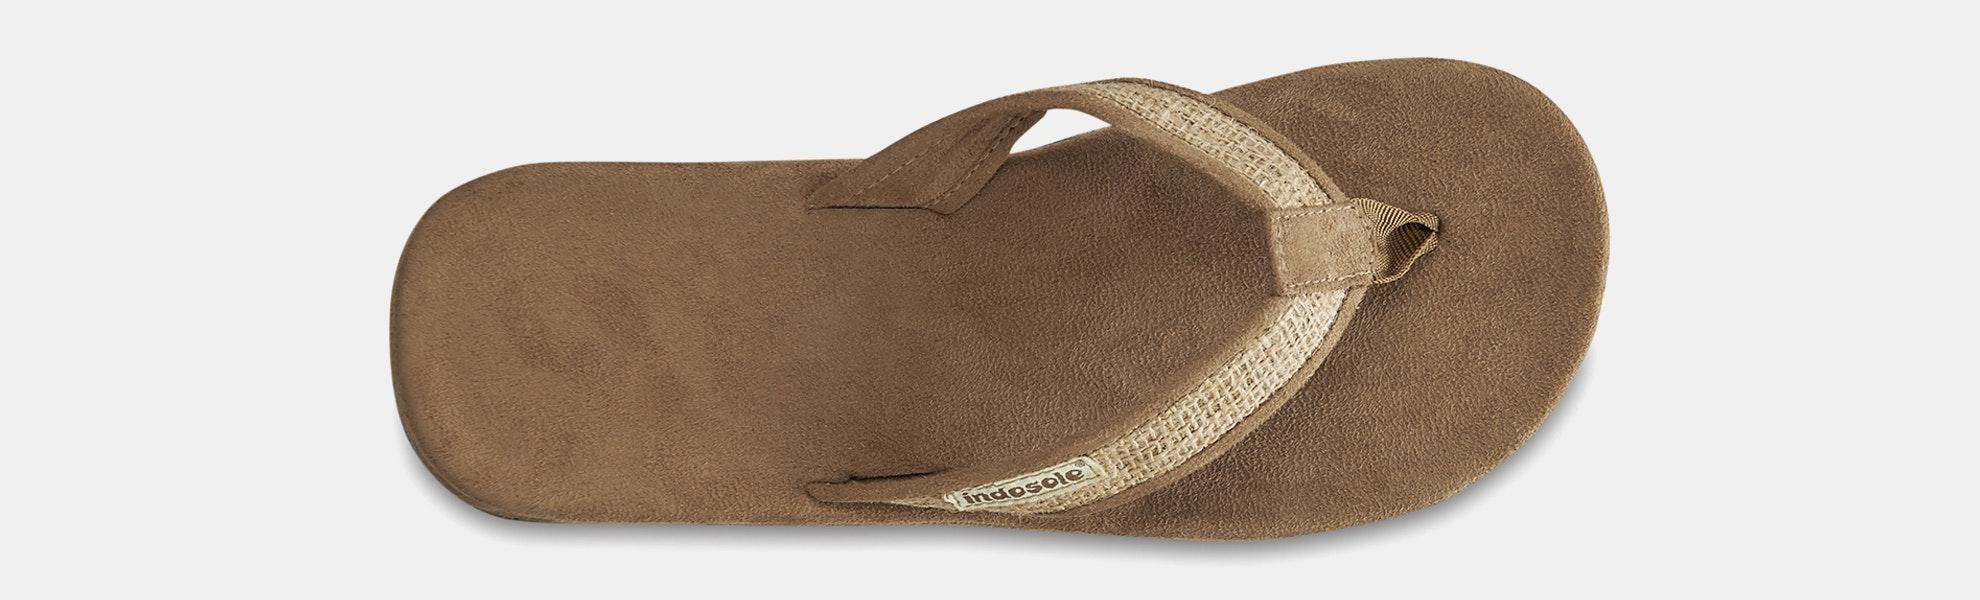 Indosole Tan Burlap Flip-Flops